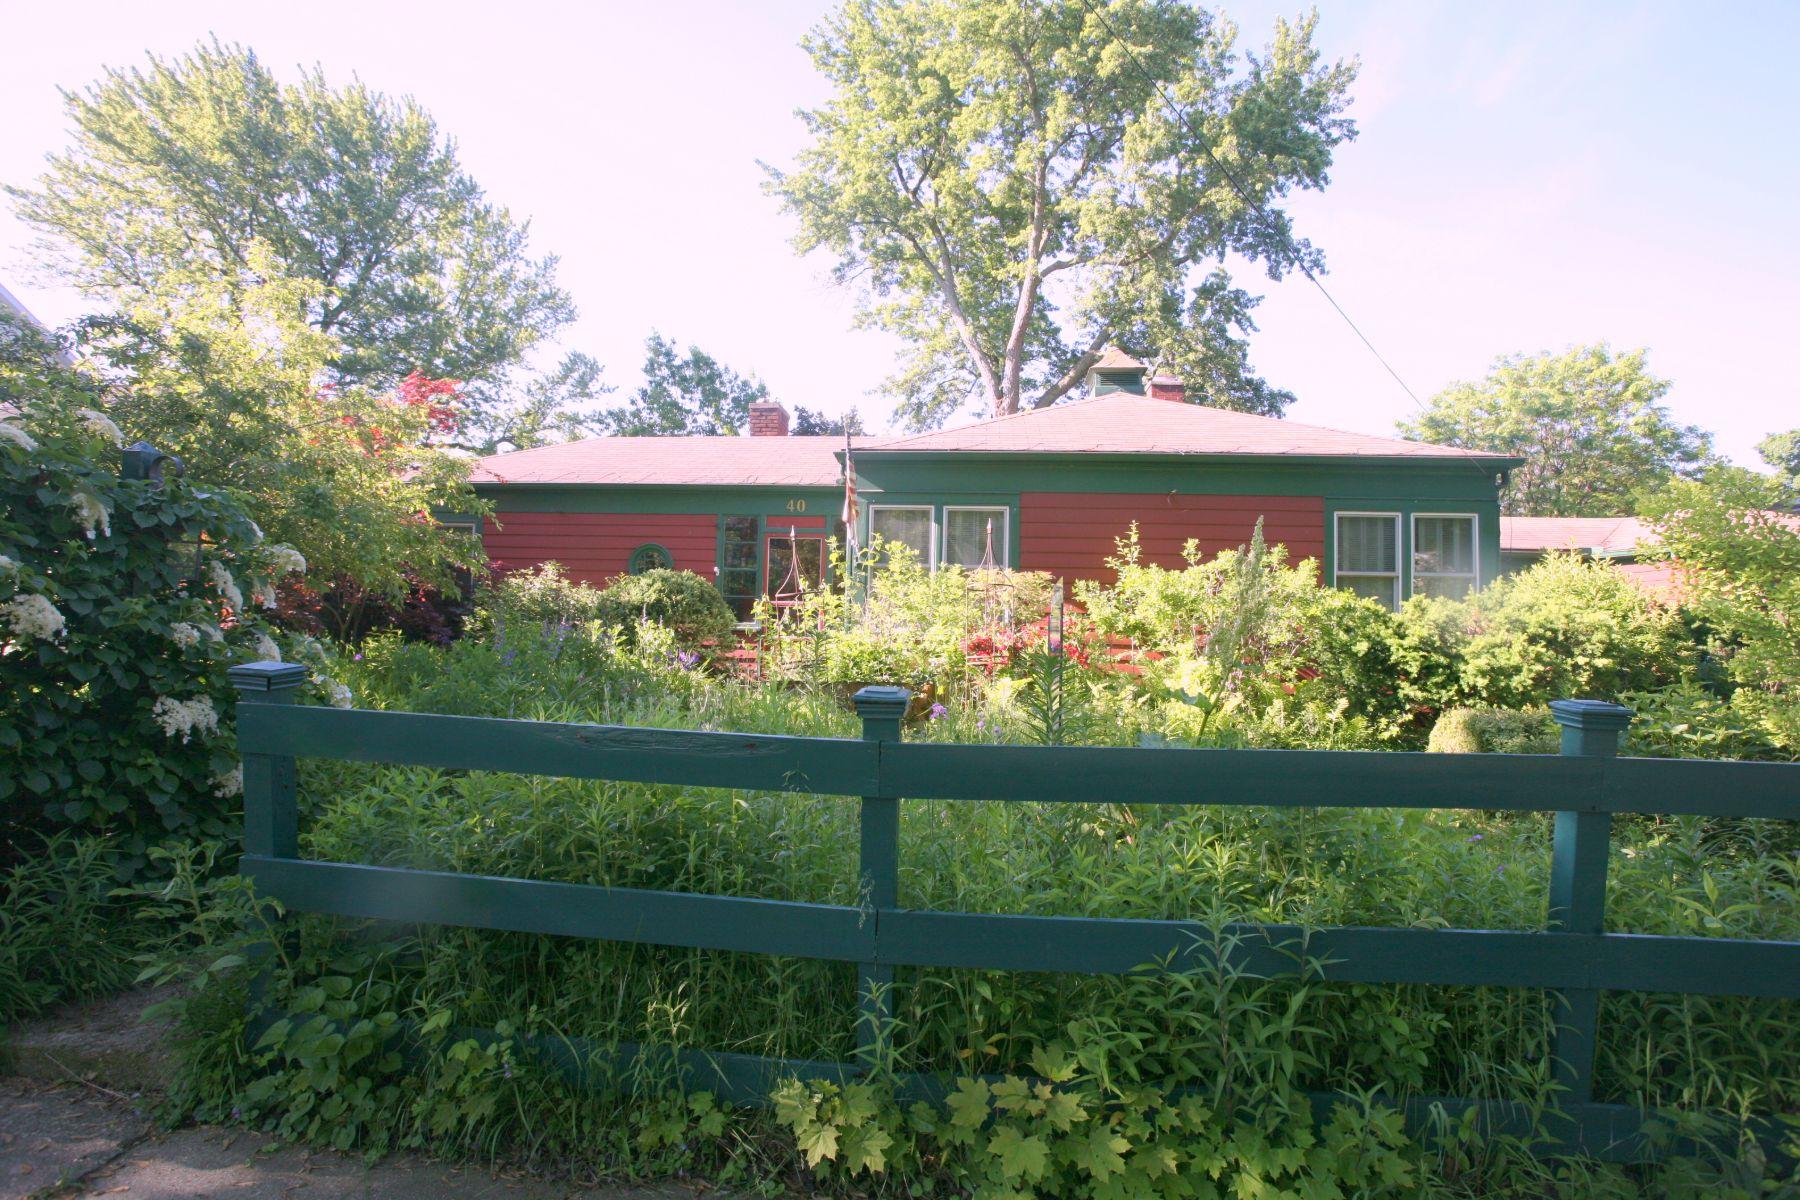 Single Family Homes for Sale at Clarkston 40 Robertson Ct Clarkston, Michigan 48346 United States